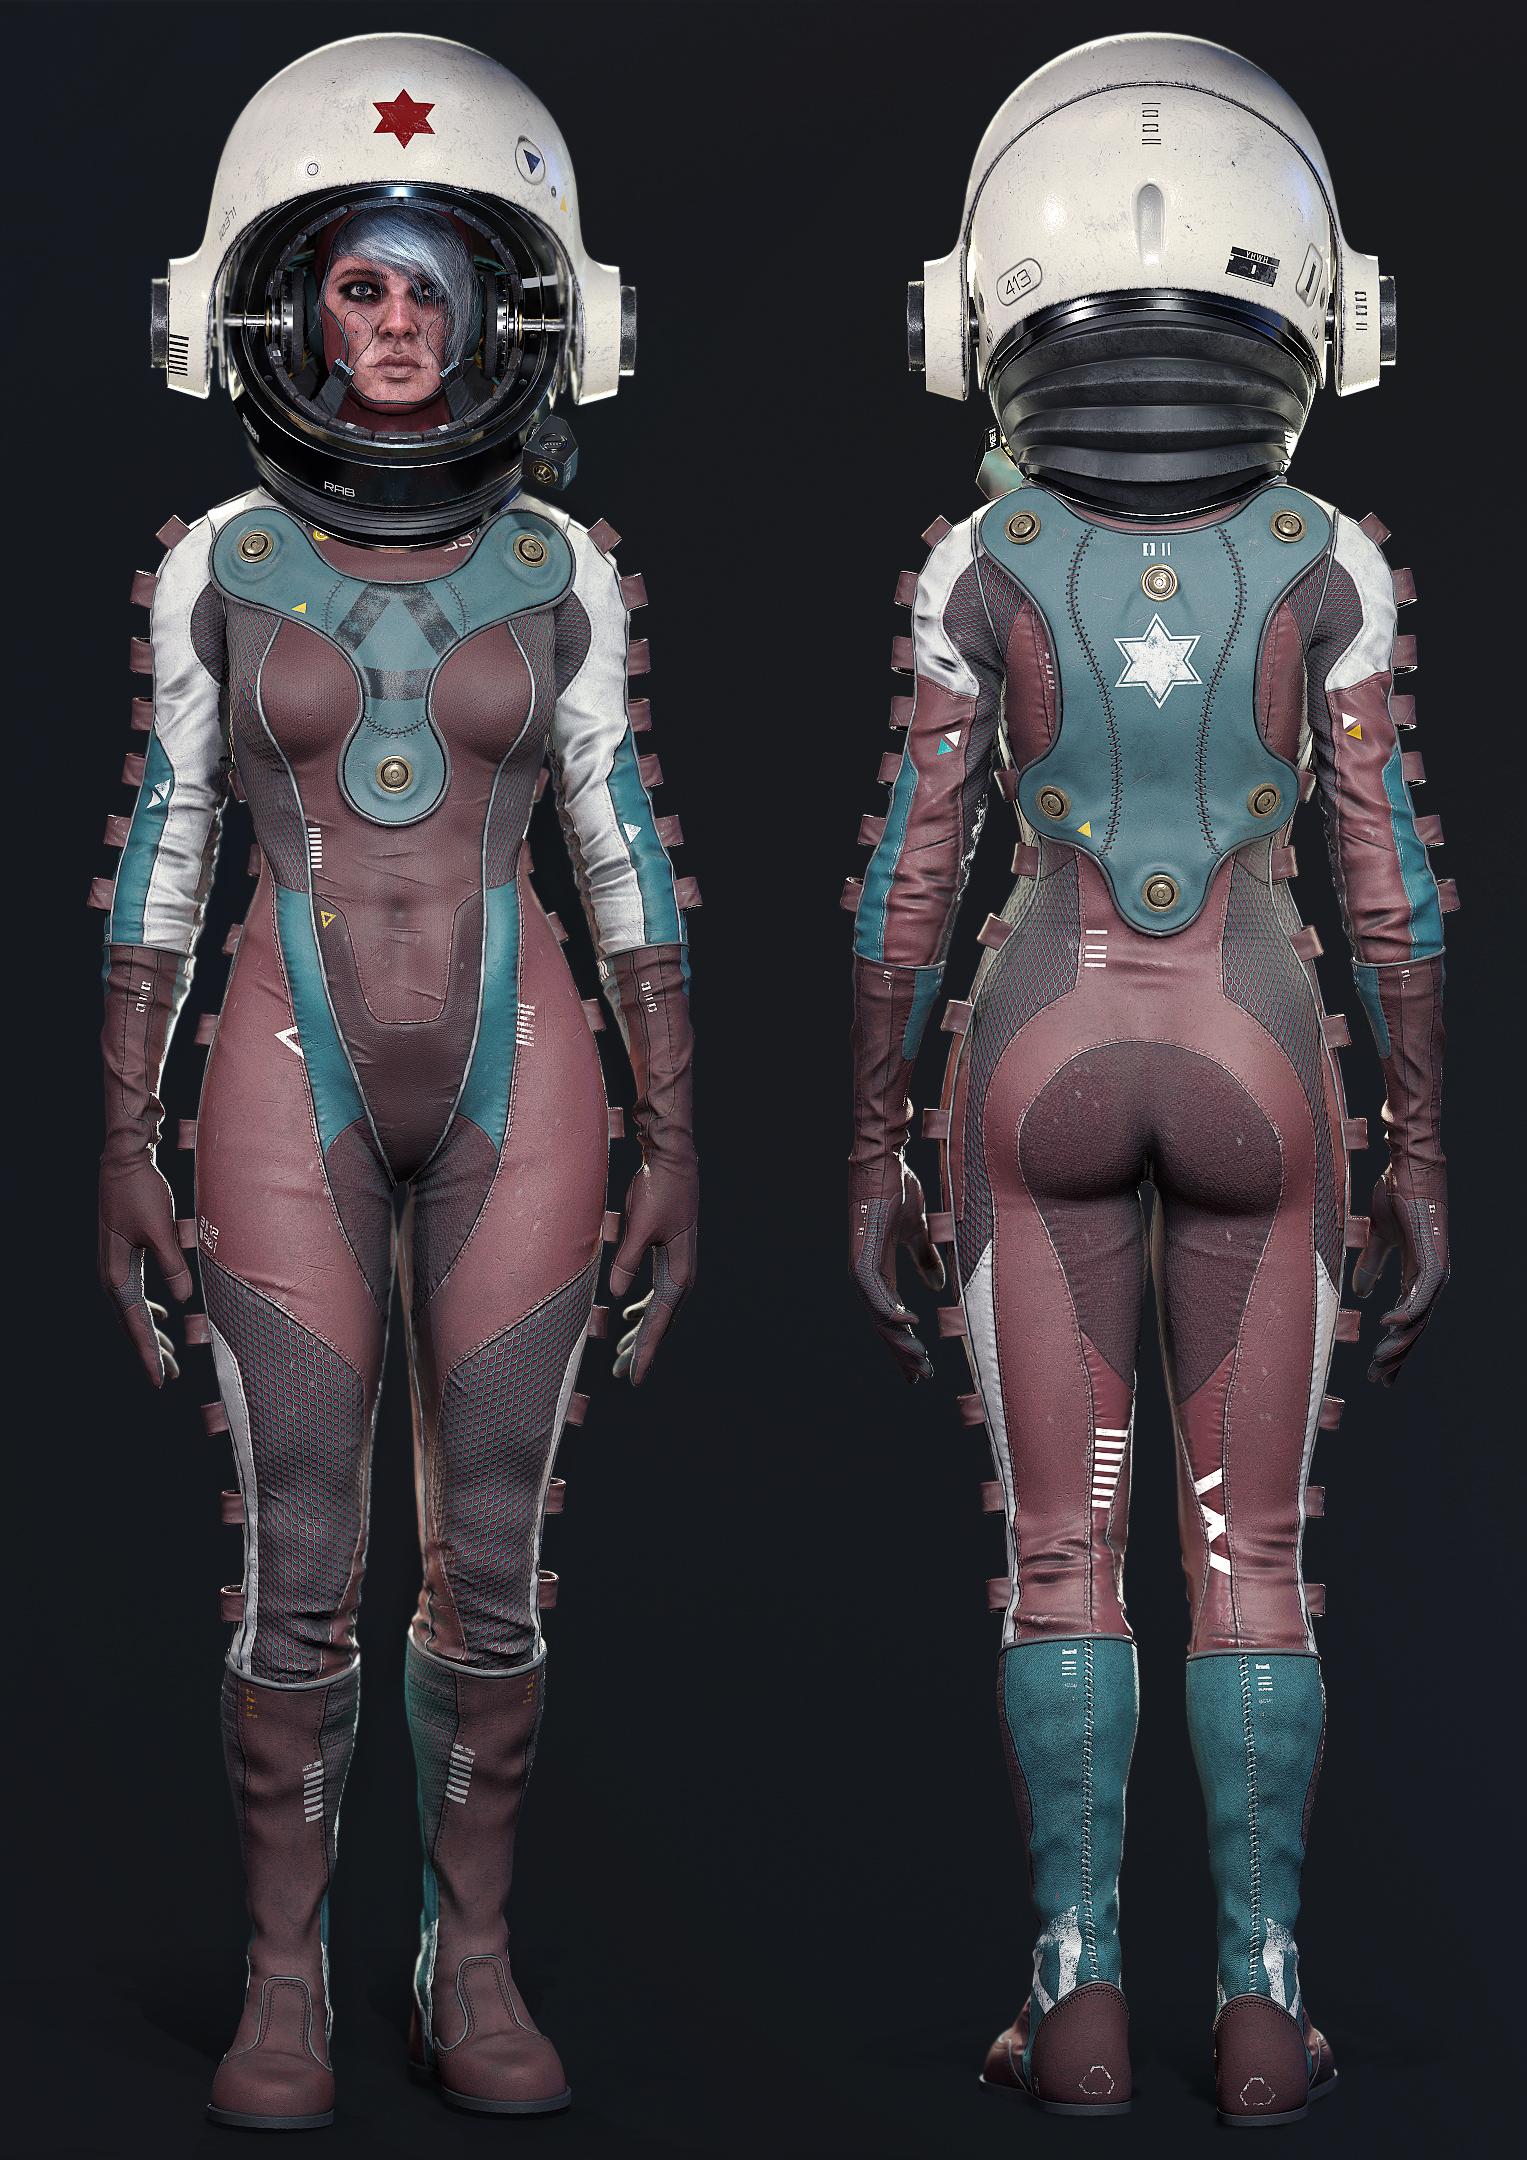 Ryan_Blake_Cosmonaut_front-back.jpg